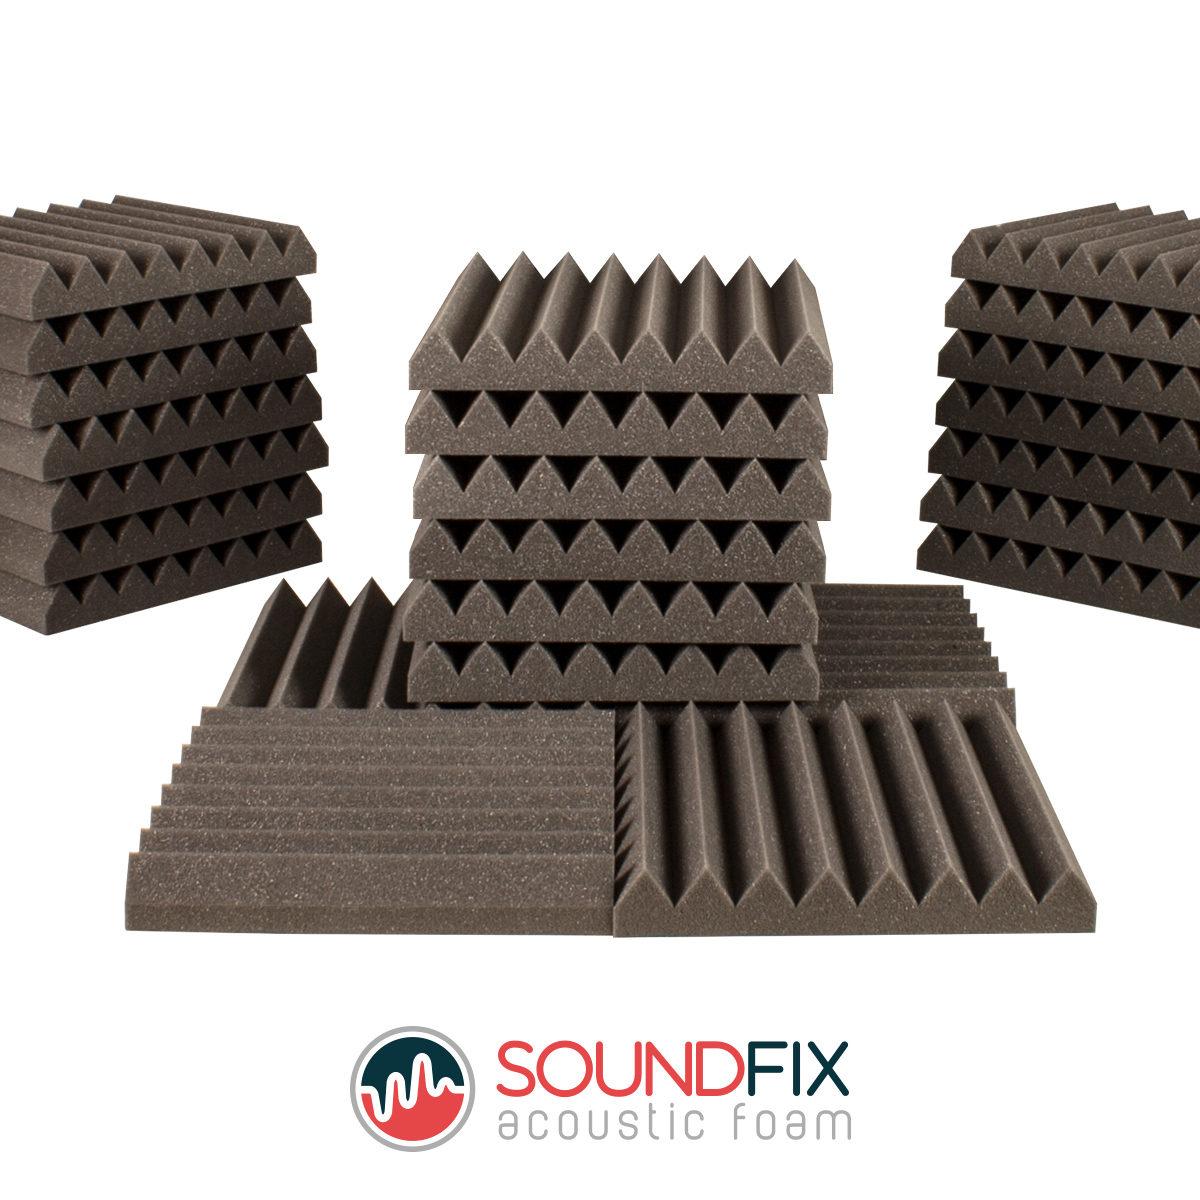 24 Acoustic Foam Tiles